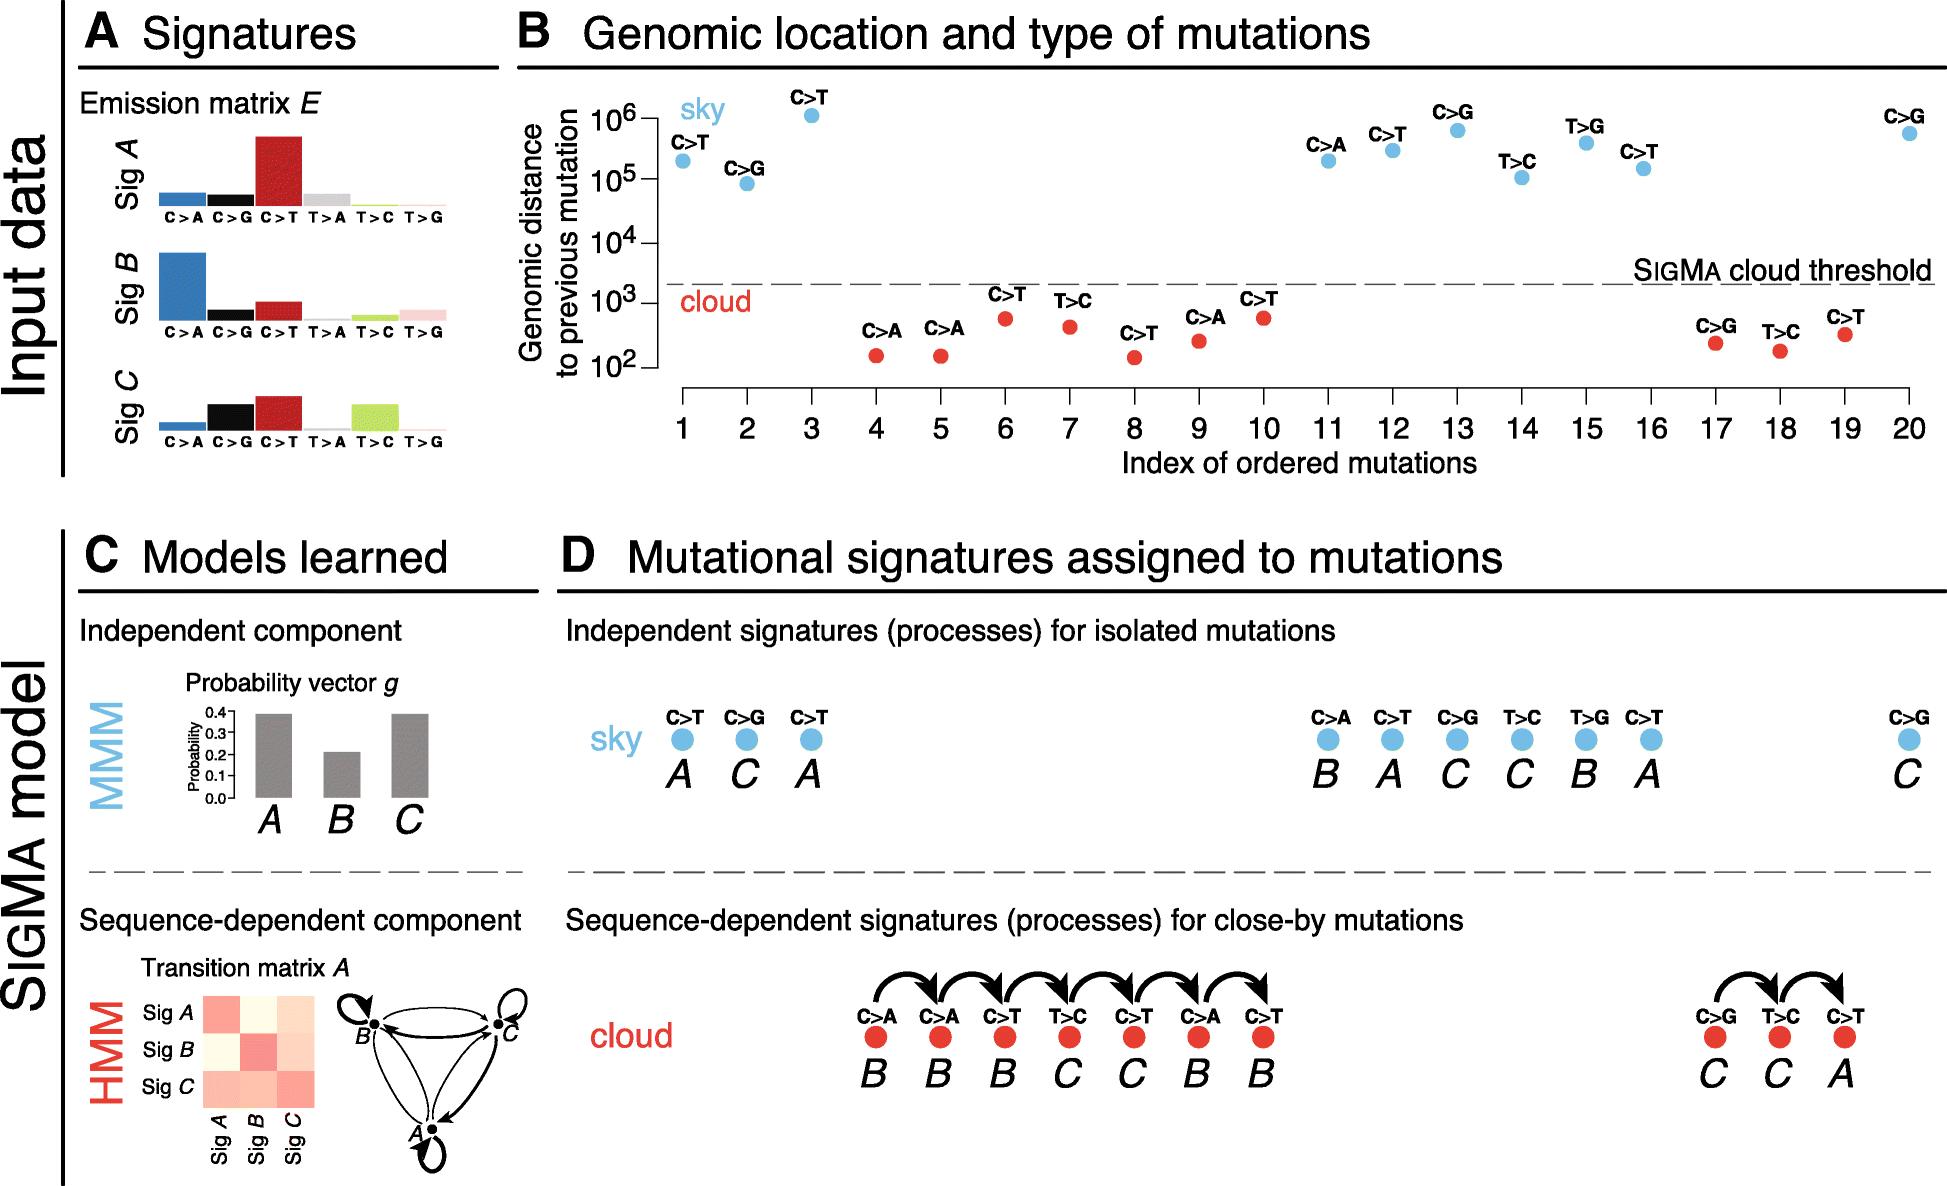 Hidden Markov models lead to higher resolution maps of mutation